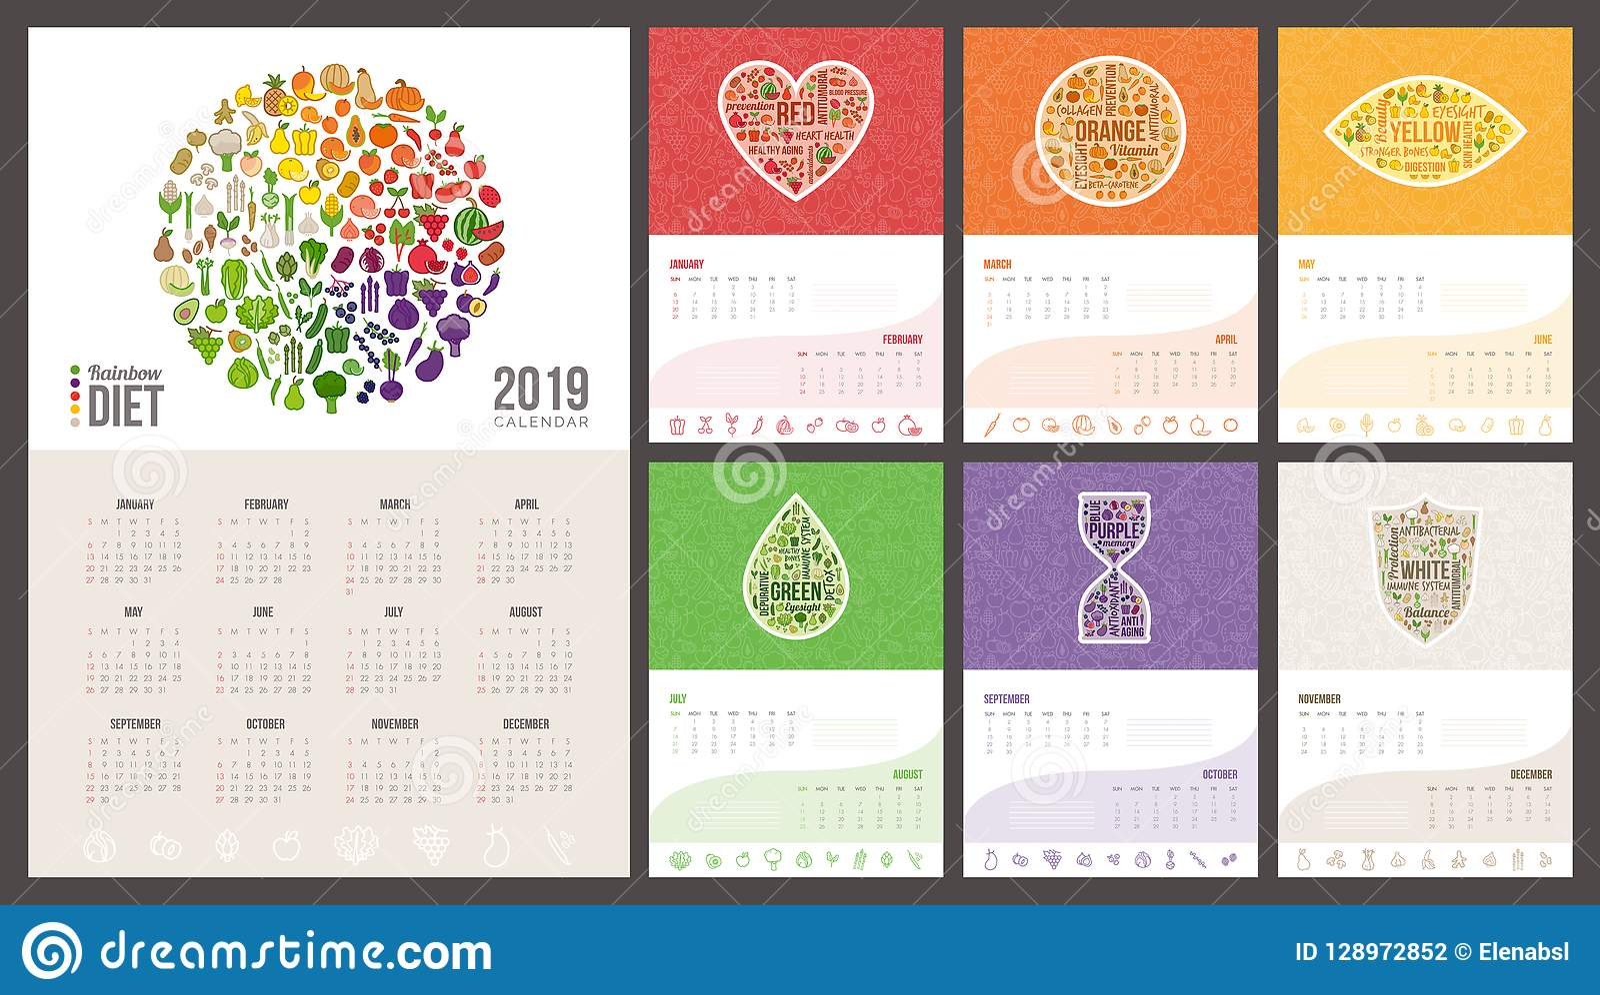 Calendario Rainbow.Rainbow Diet Calendar 2019 Stock Vector Illustration Of